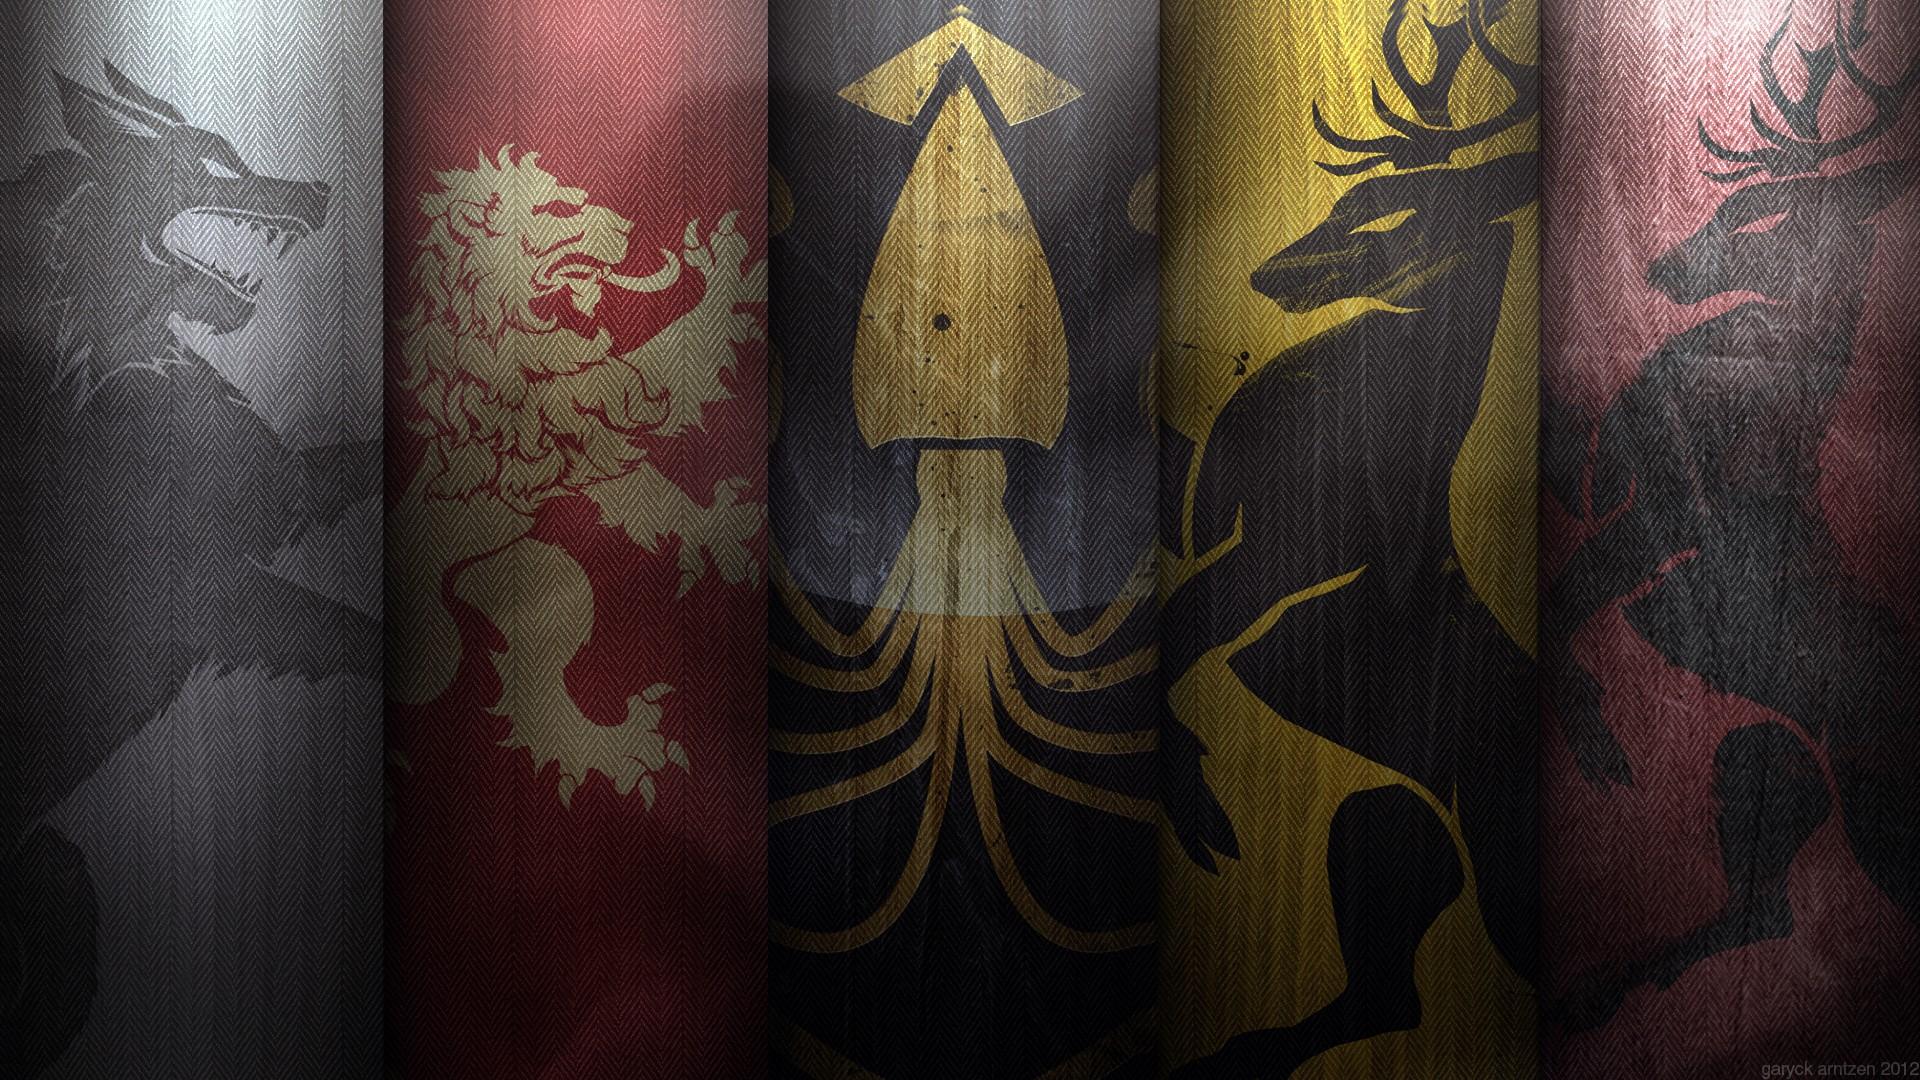 Zoom a juego de tronos temporada 3 final de temporada for Decoracion juego de tronos